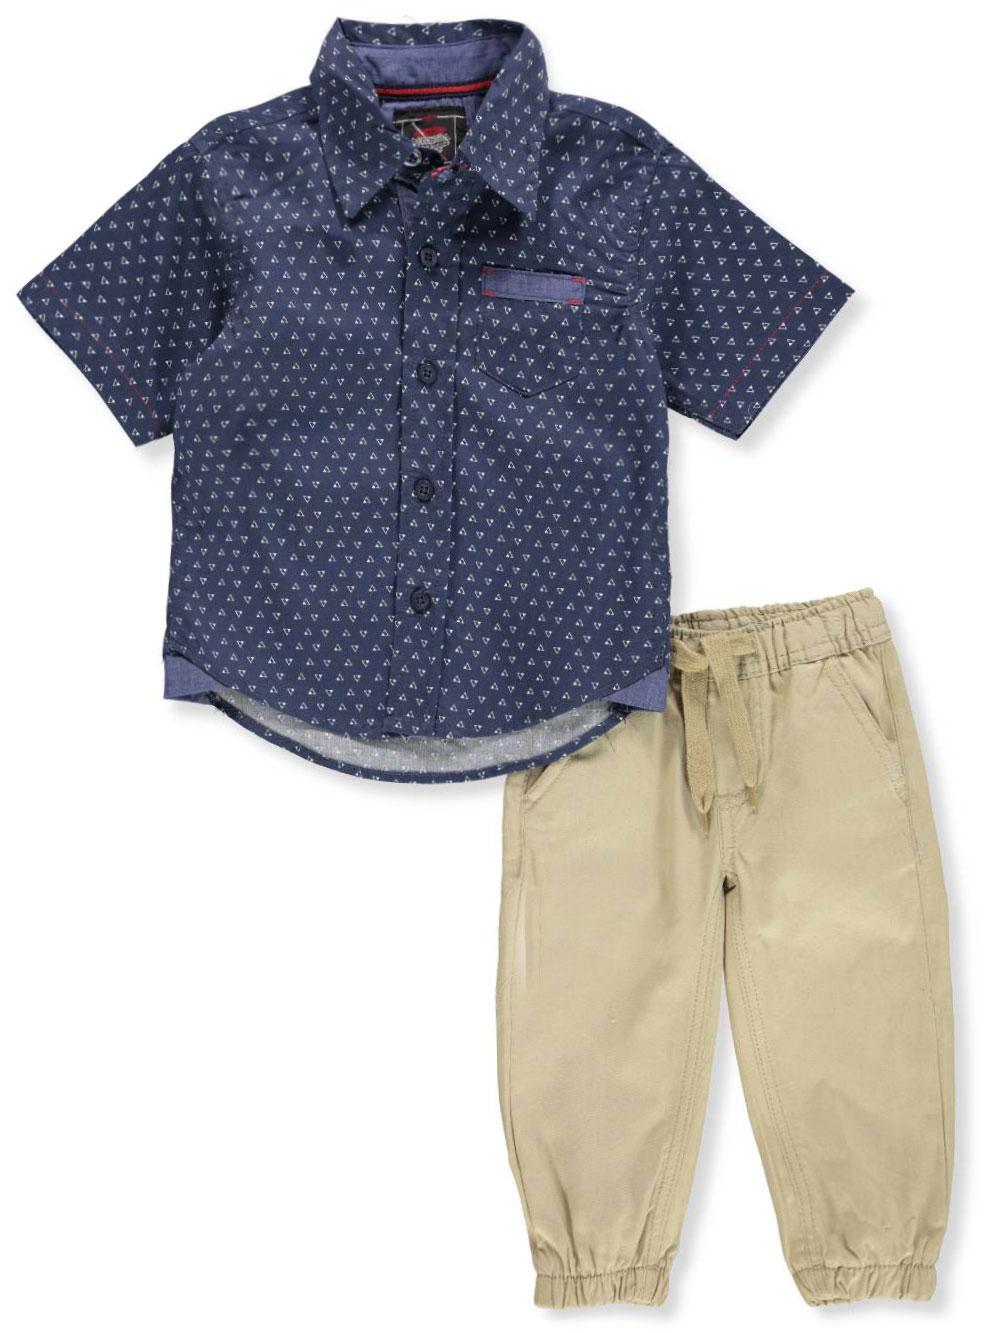 aa14fe1a3 Retro Stitch Baby Boys  2-Piece Pants Set Outfit